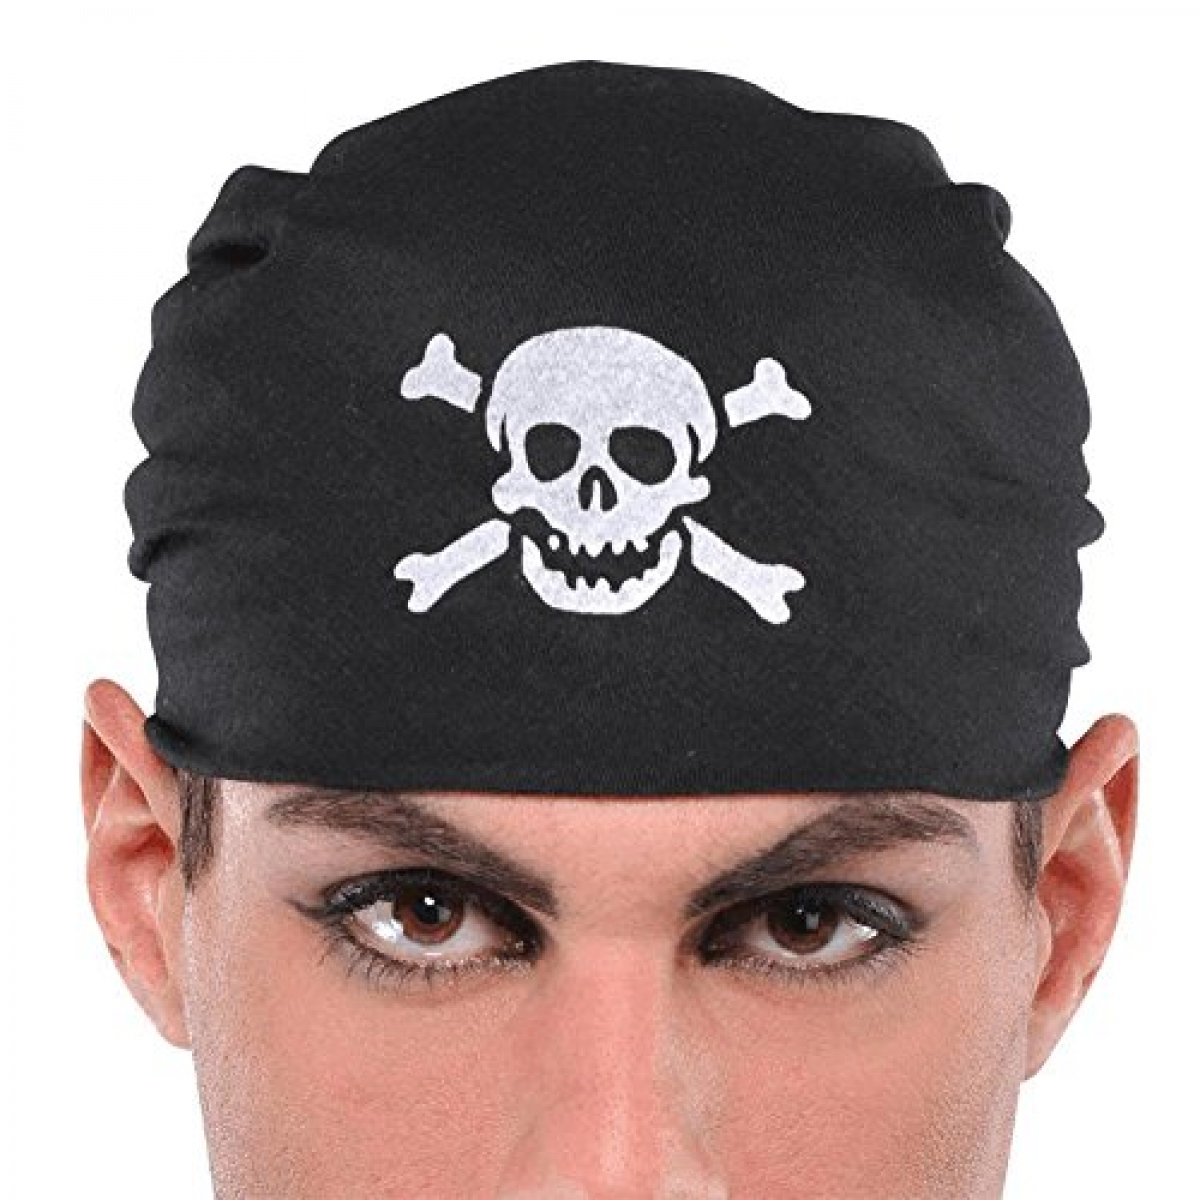 Бандана пирата своими руками 97